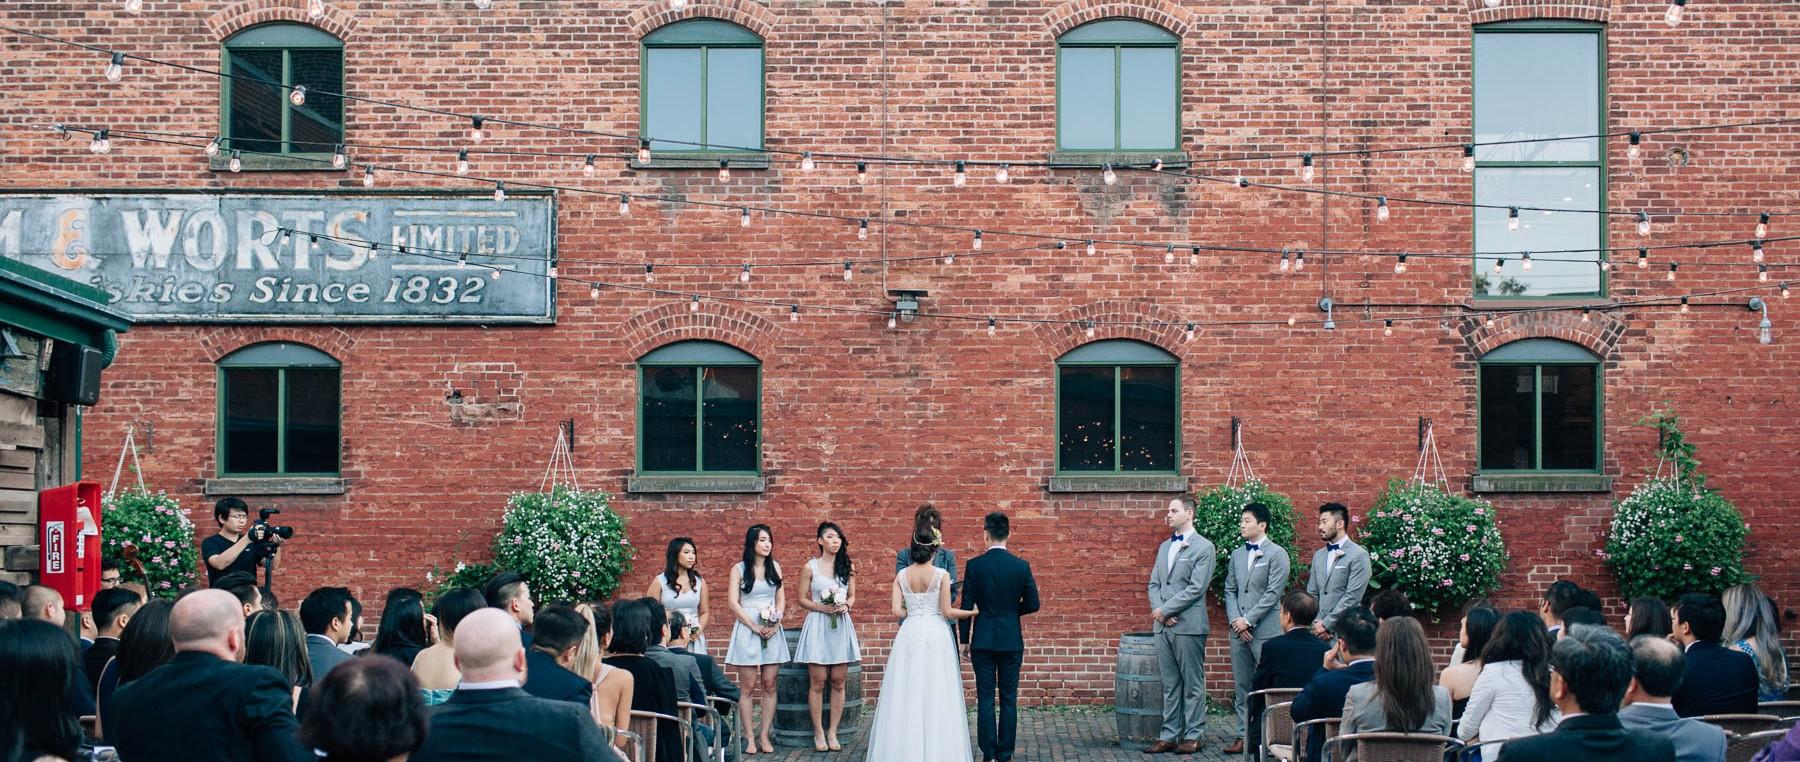 Toronto Restaurant Wedding Venues Toronto Wedding Photographer